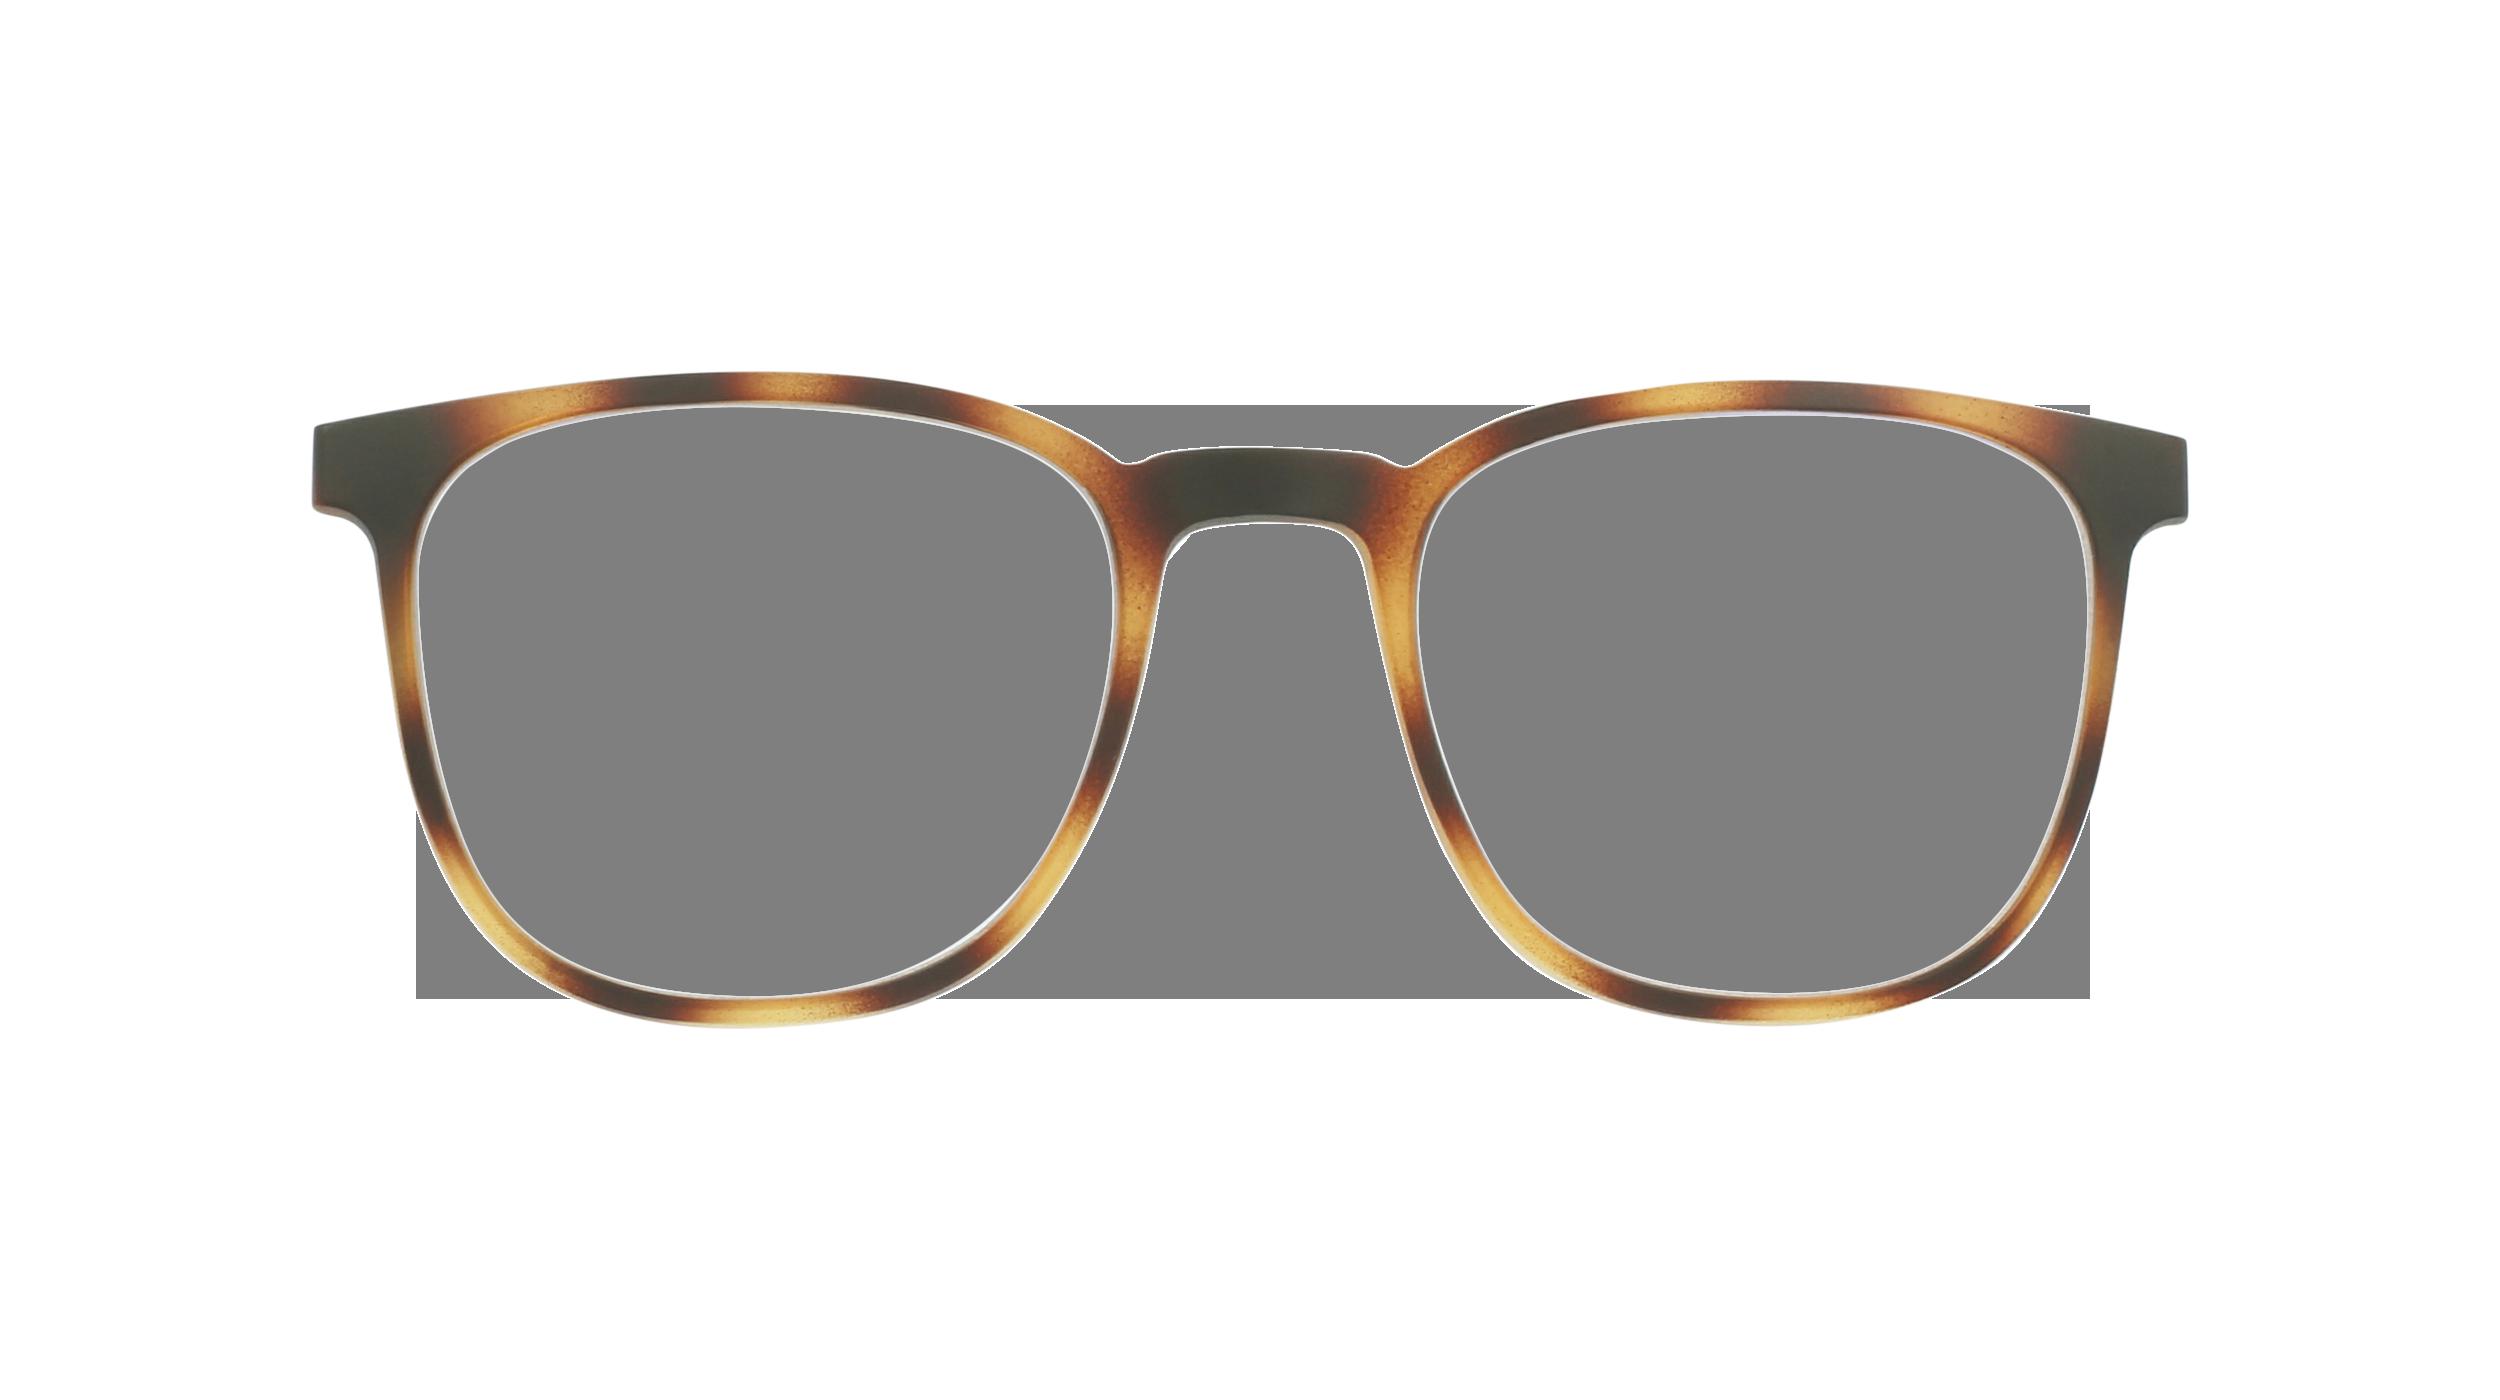 afflelou/france/products/smart_clip/clips_glasses/07630036457368.png